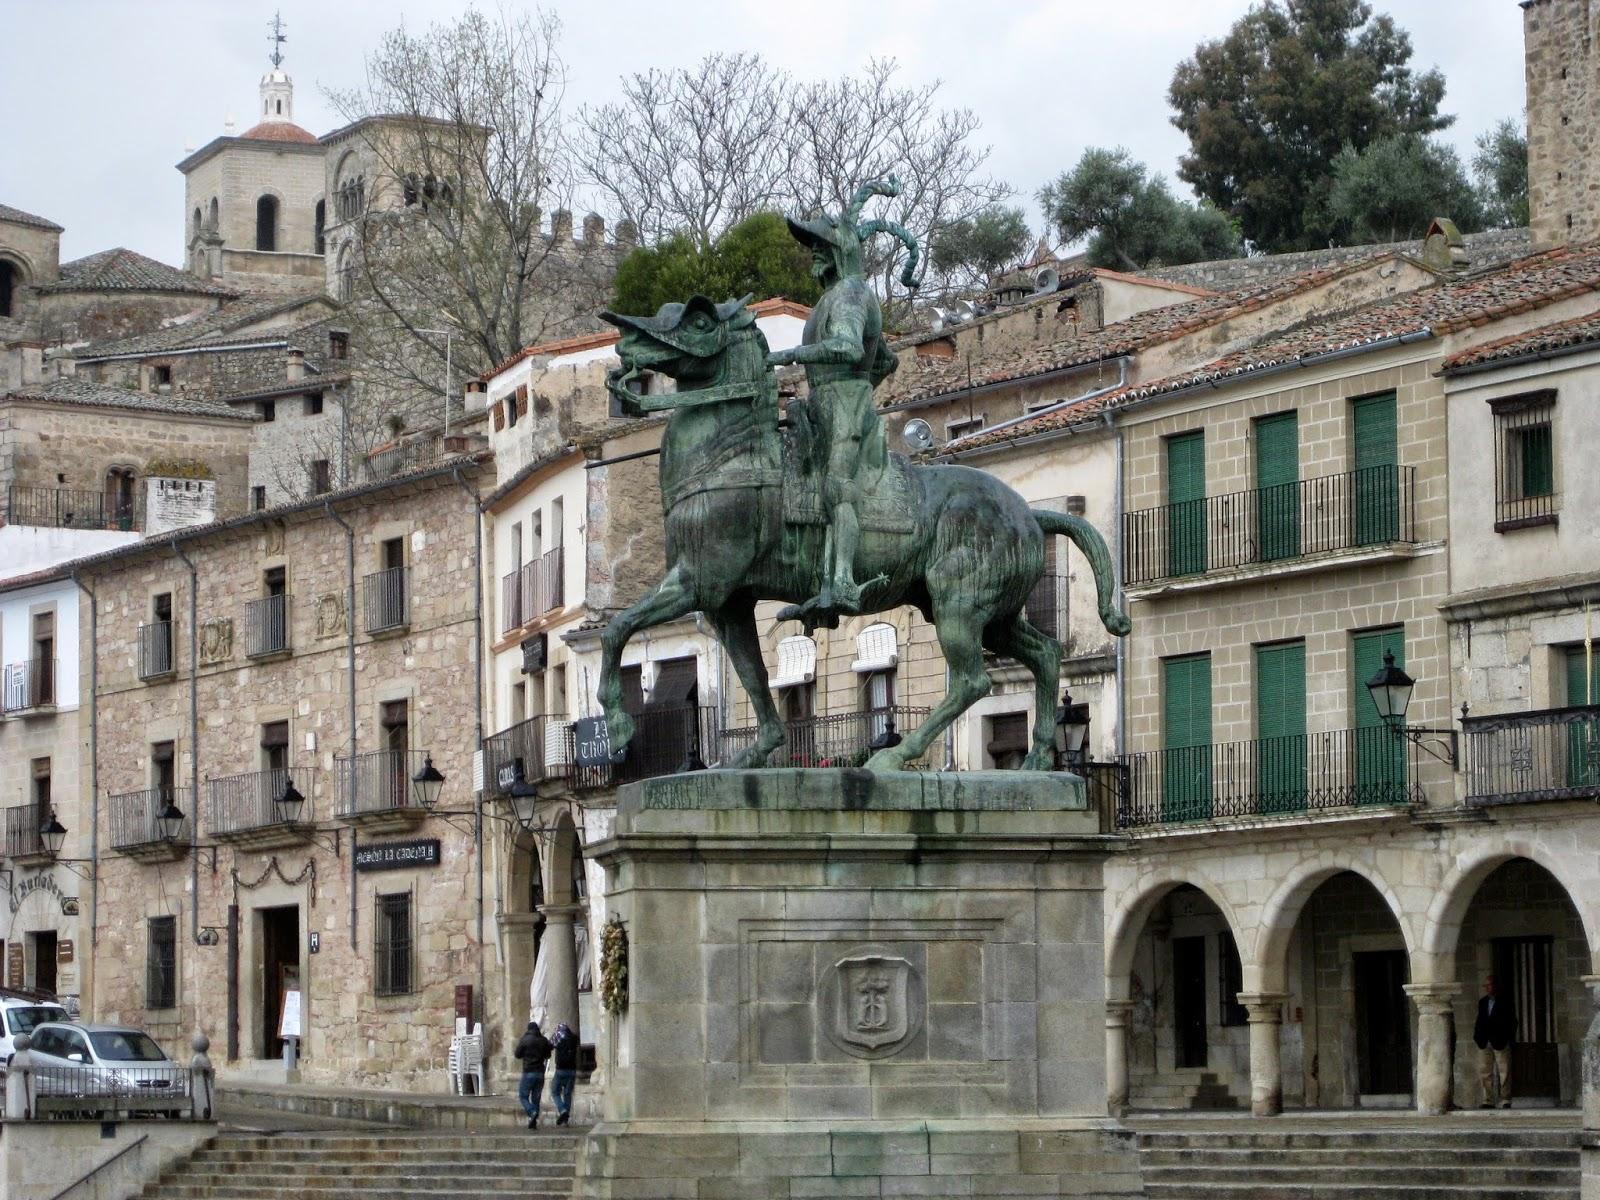 La Ruta de Isabel. Estatua del descubridor Pizarro en Trujillo